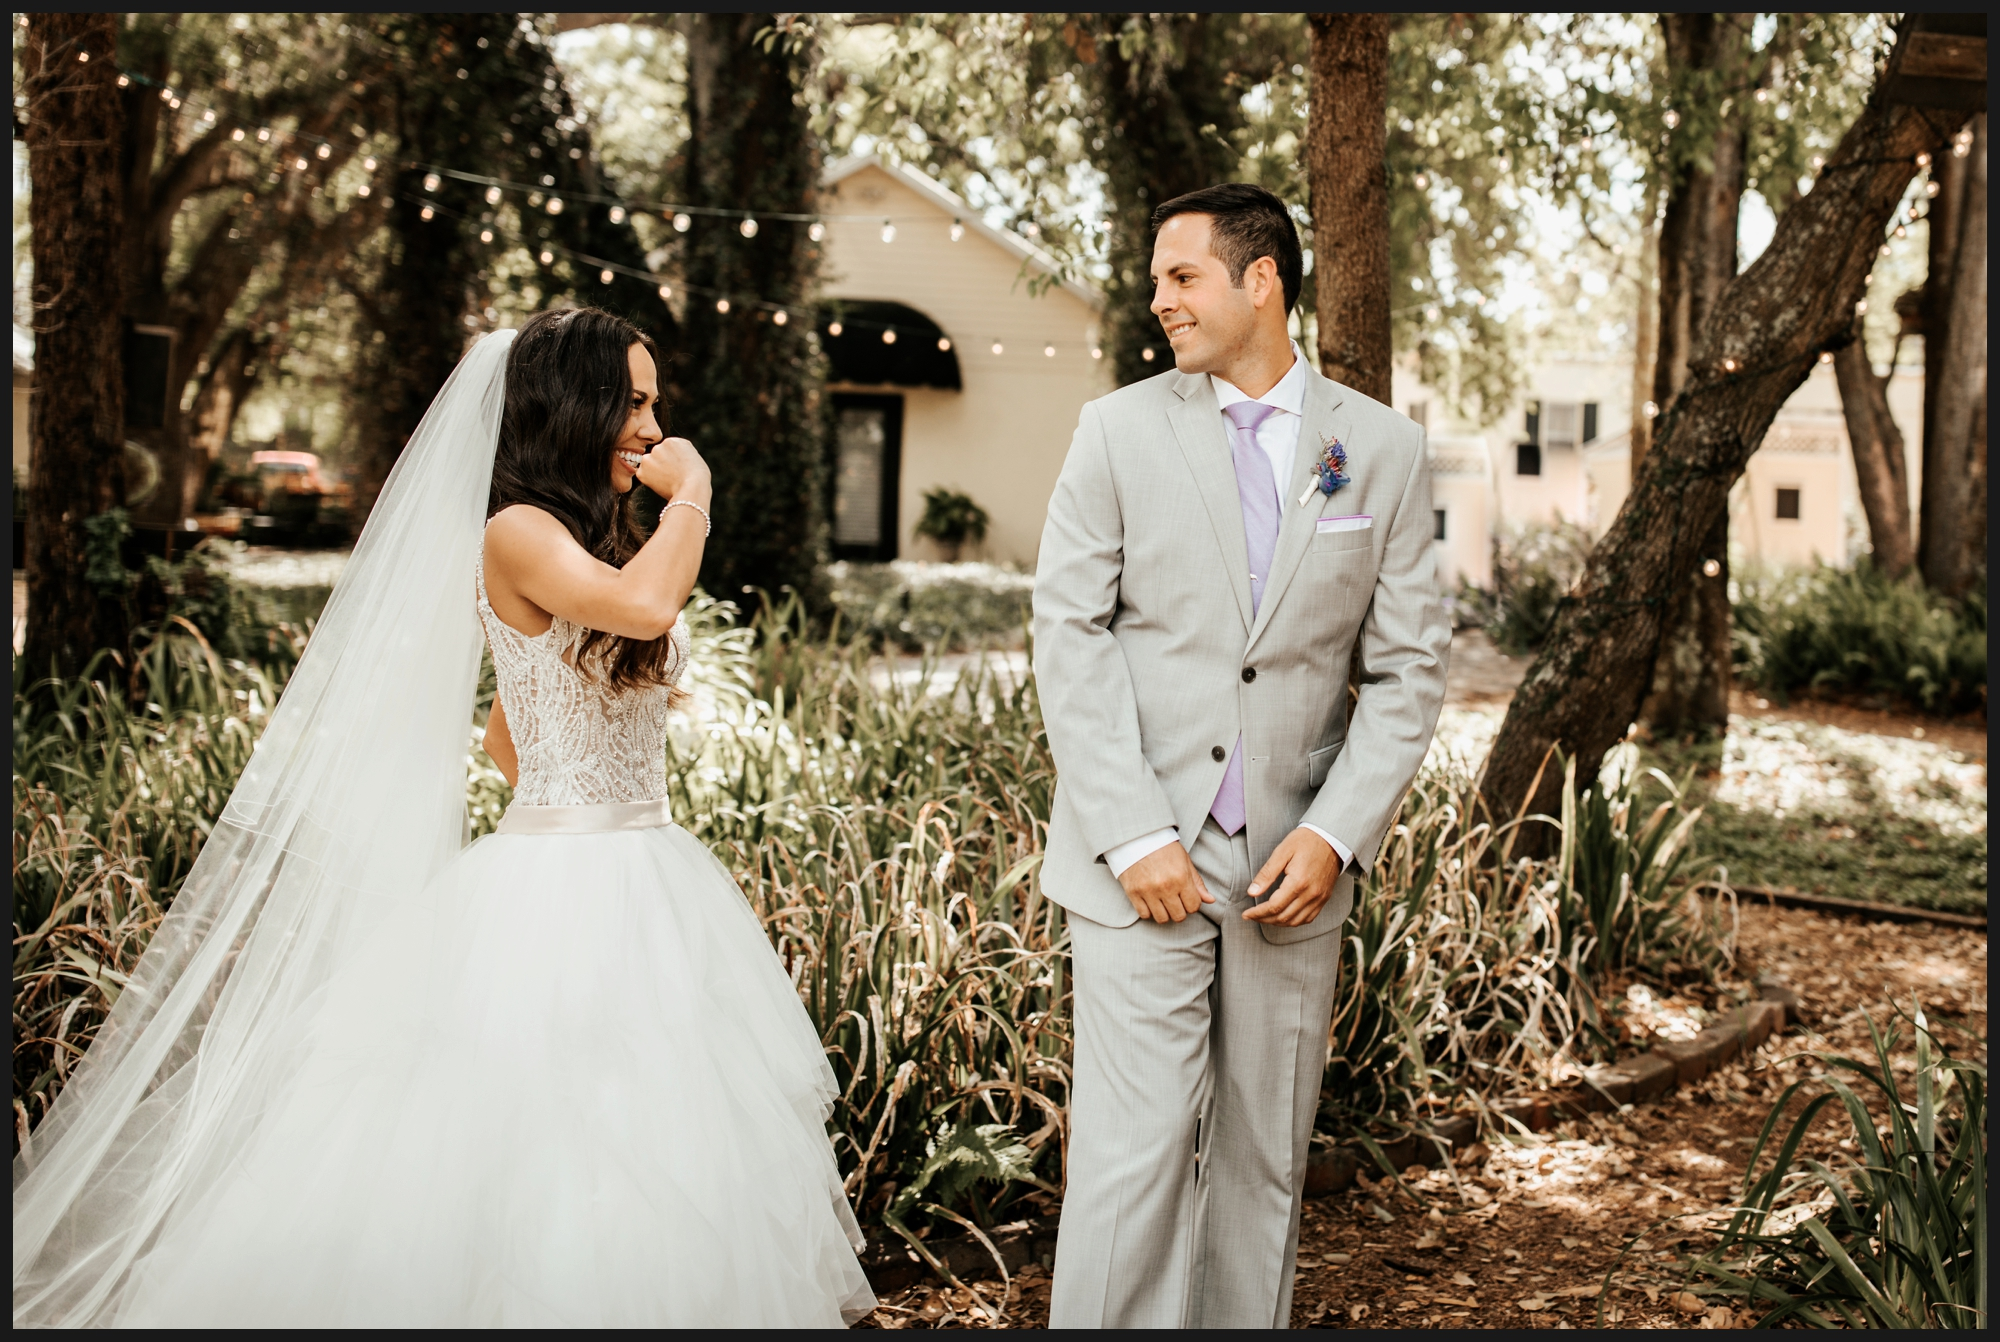 Orlando-Wedding-Photographer-destination-wedding-photographer-florida-wedding-photographer-bohemian-wedding-photographer_1596.jpg